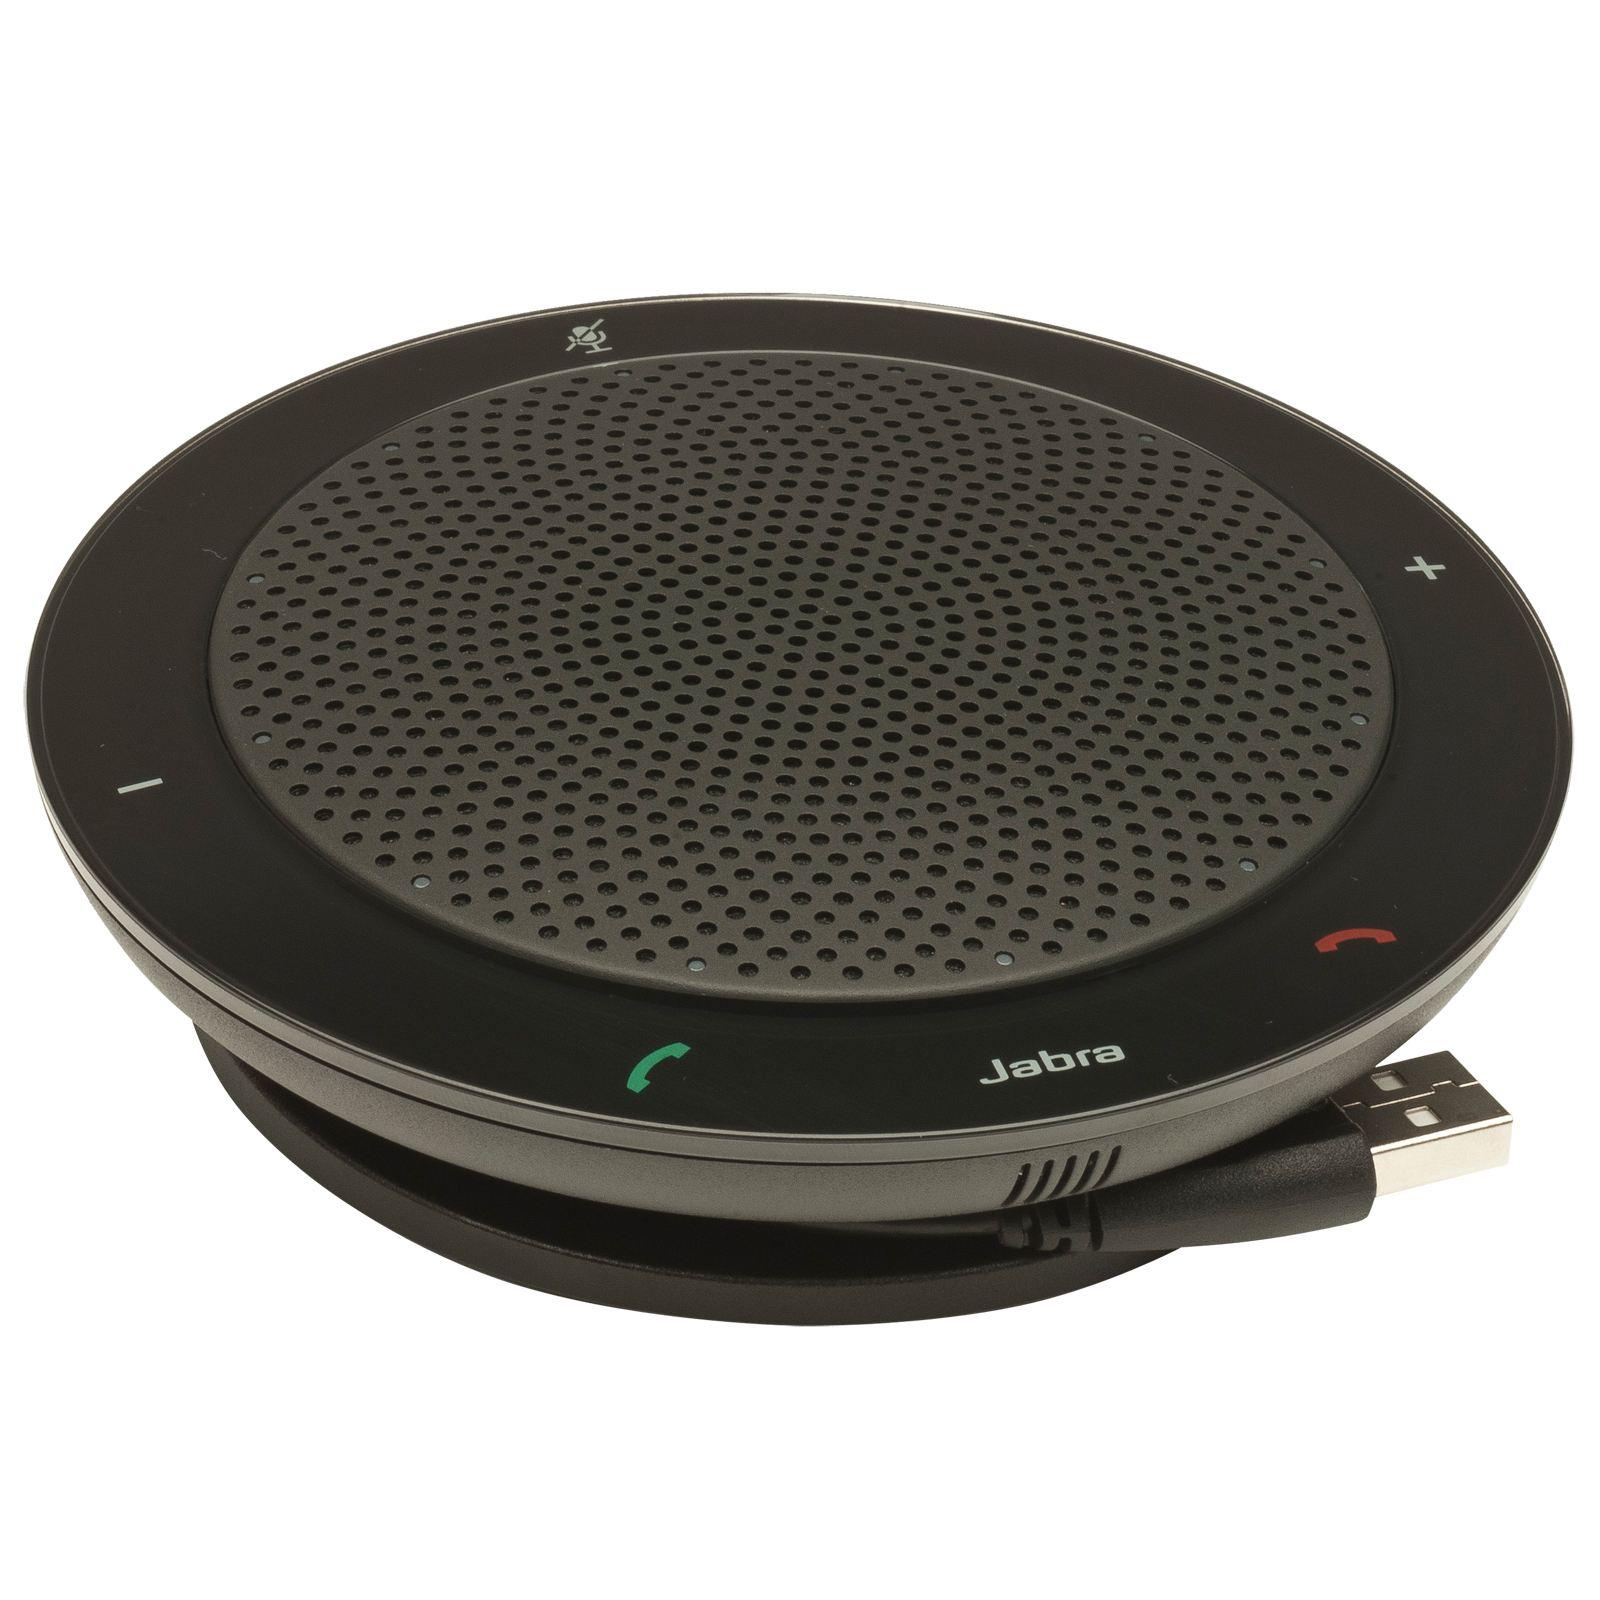 Jabra SPEAK 410, USB